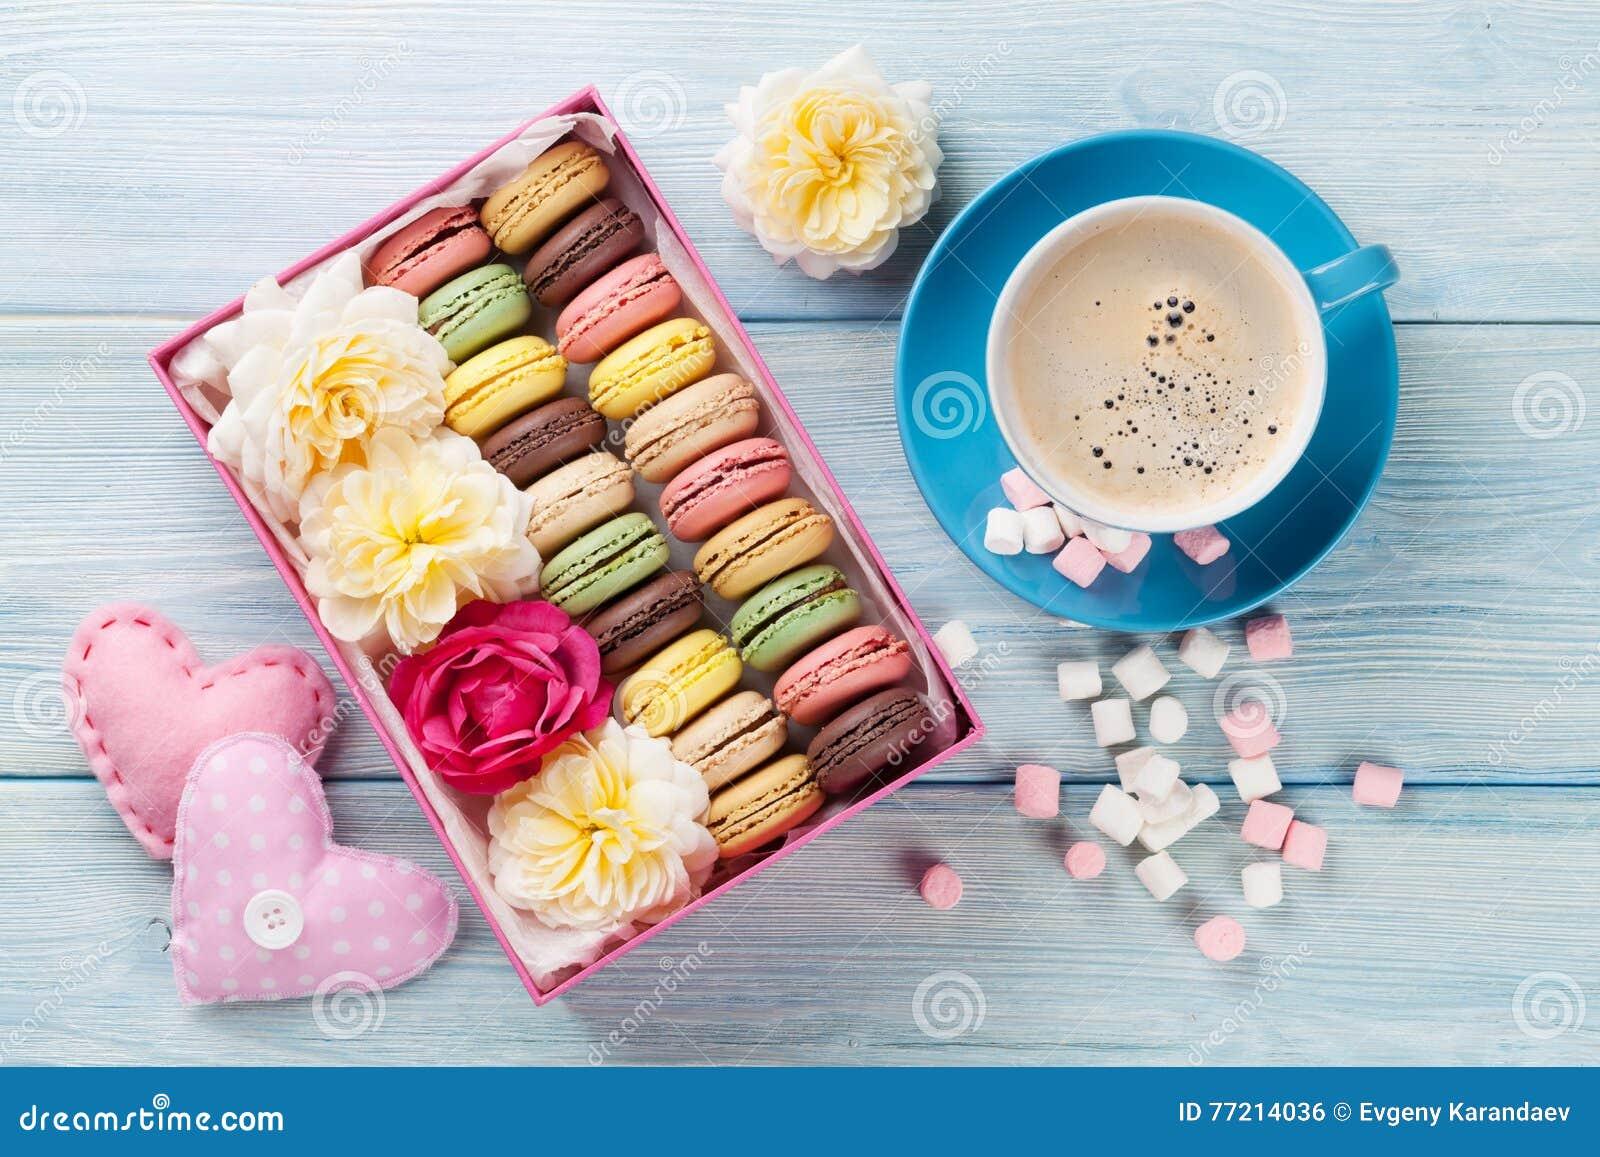 Macaroons And Coffee. Sweet Macarons In Gift Box Stock Photo ...